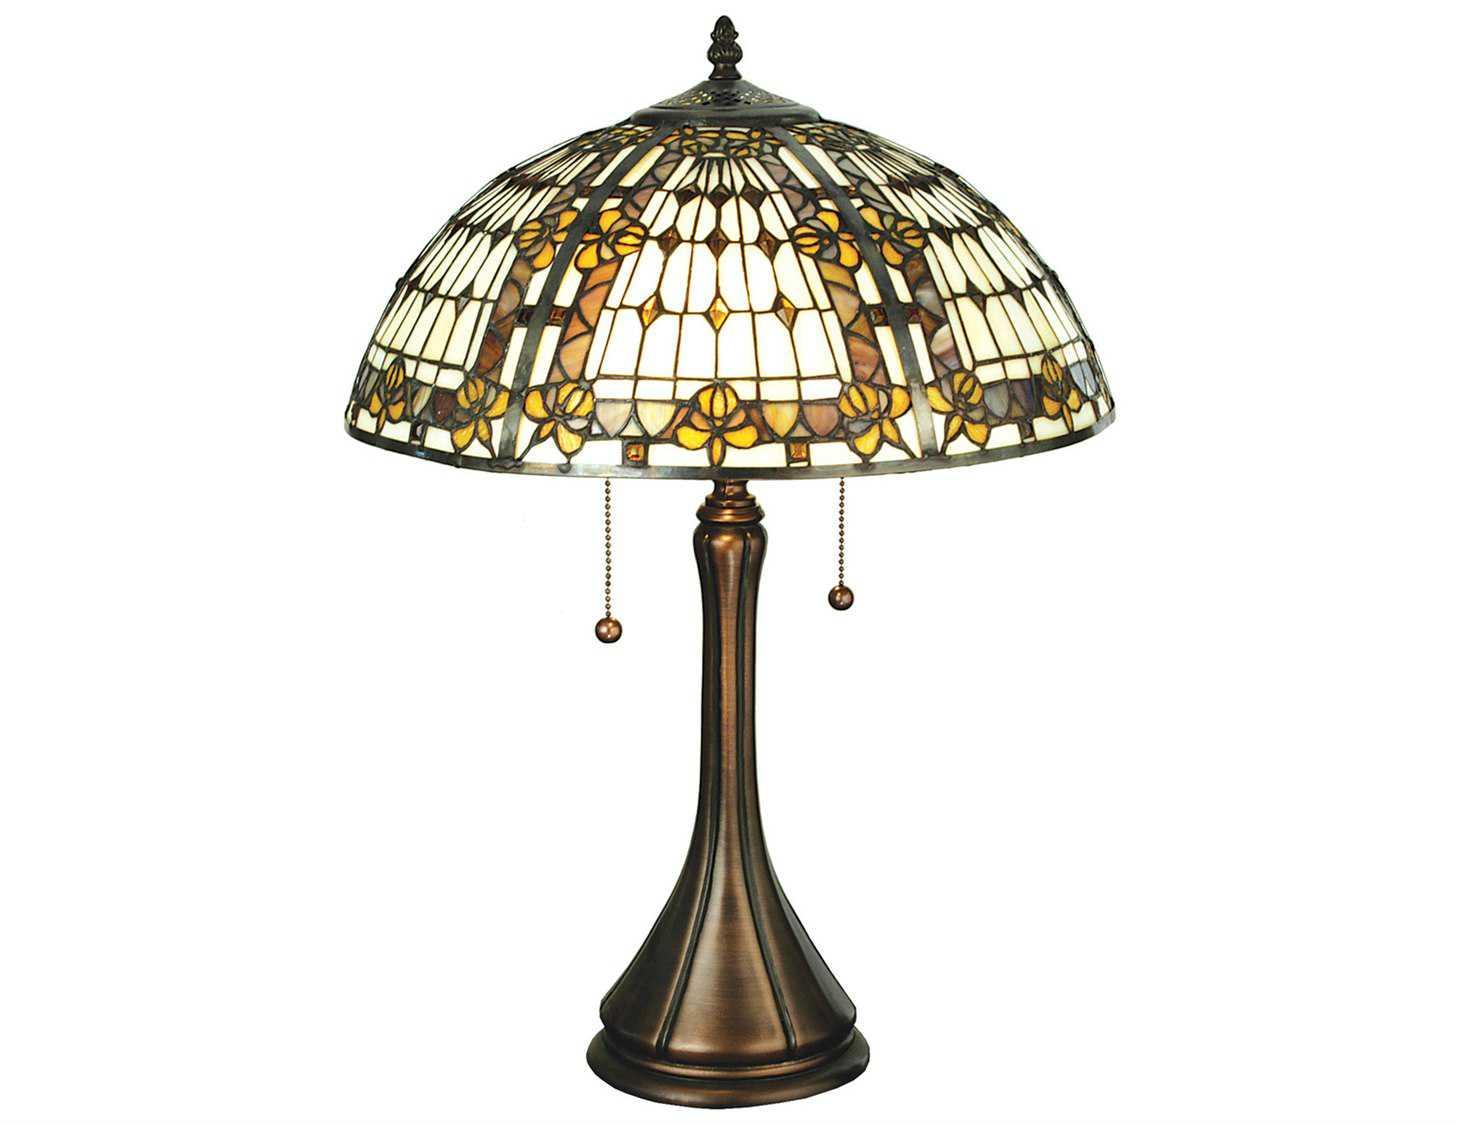 meyda tiffany fleur de lis multi color table lamp 27031. Black Bedroom Furniture Sets. Home Design Ideas